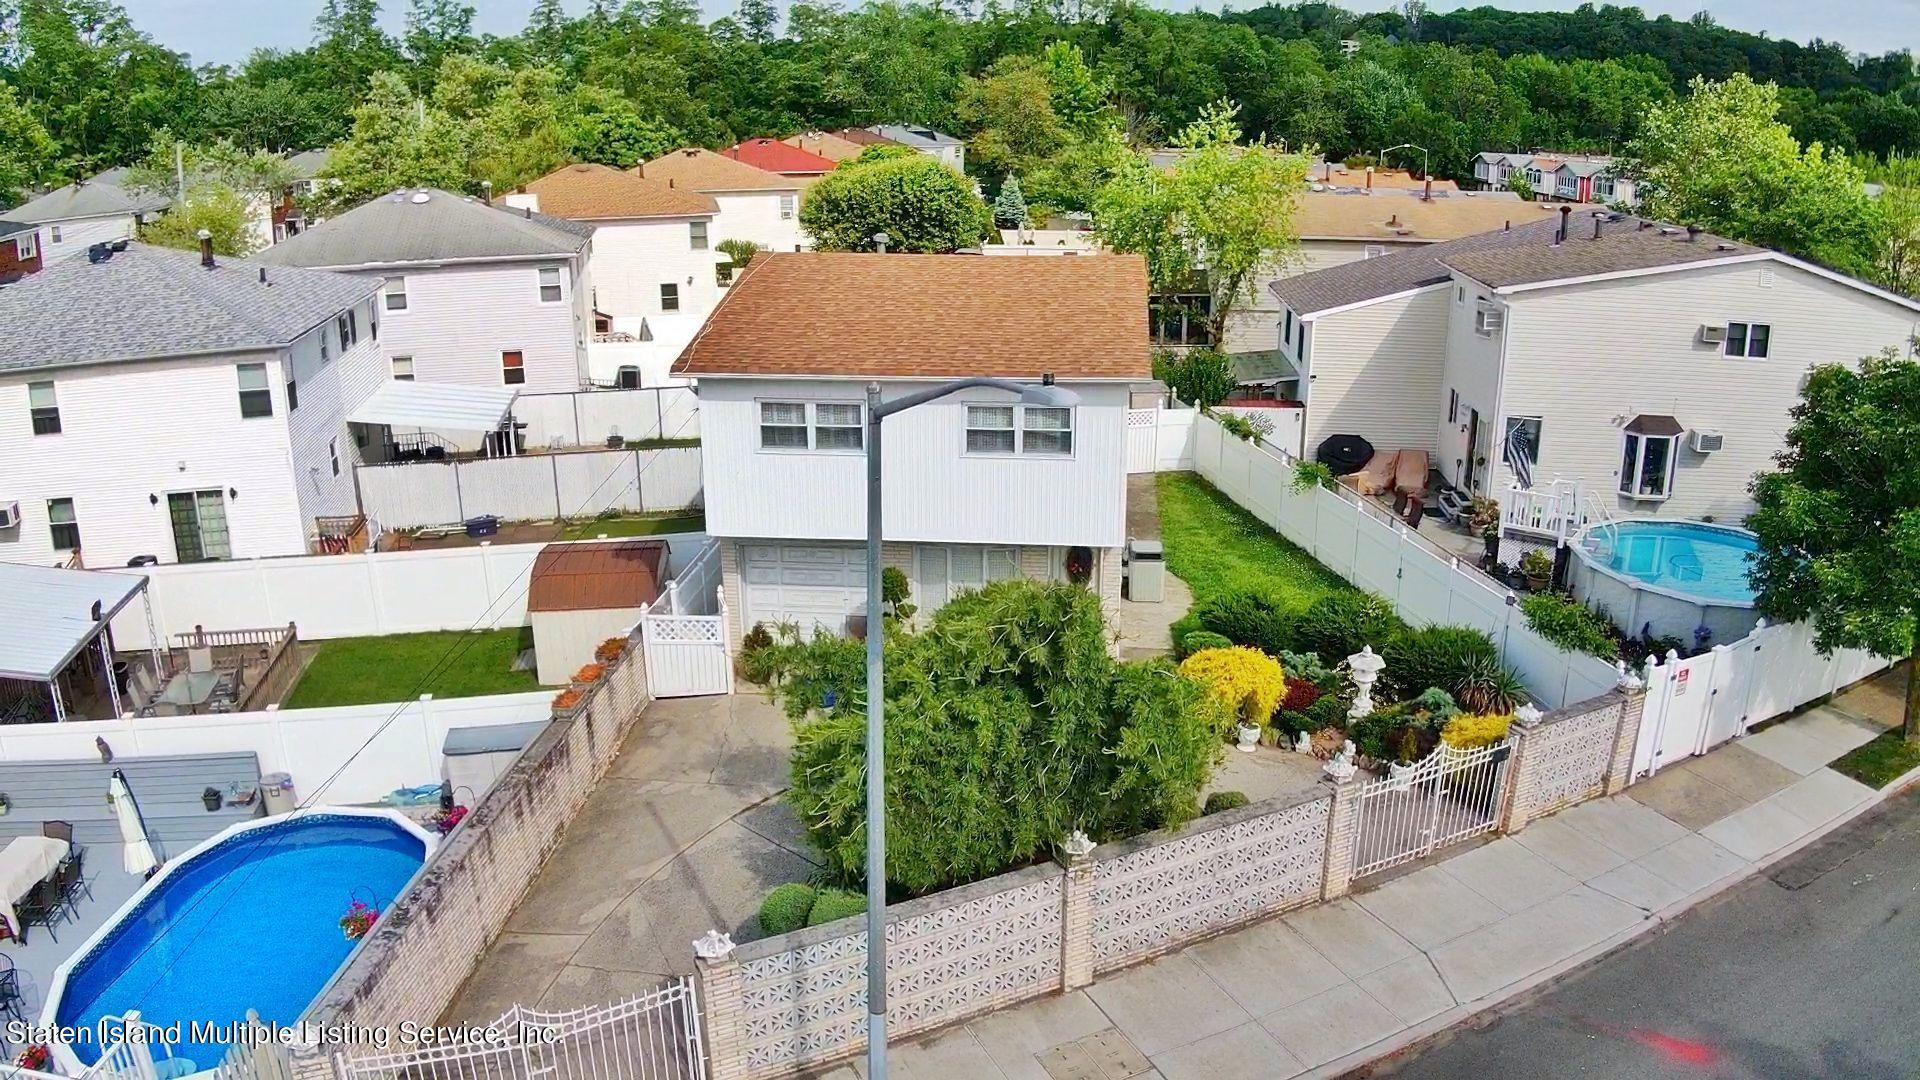 Single Family - Detached 94 Cranford Avenue  Staten Island, NY 10306, MLS-1146620-47